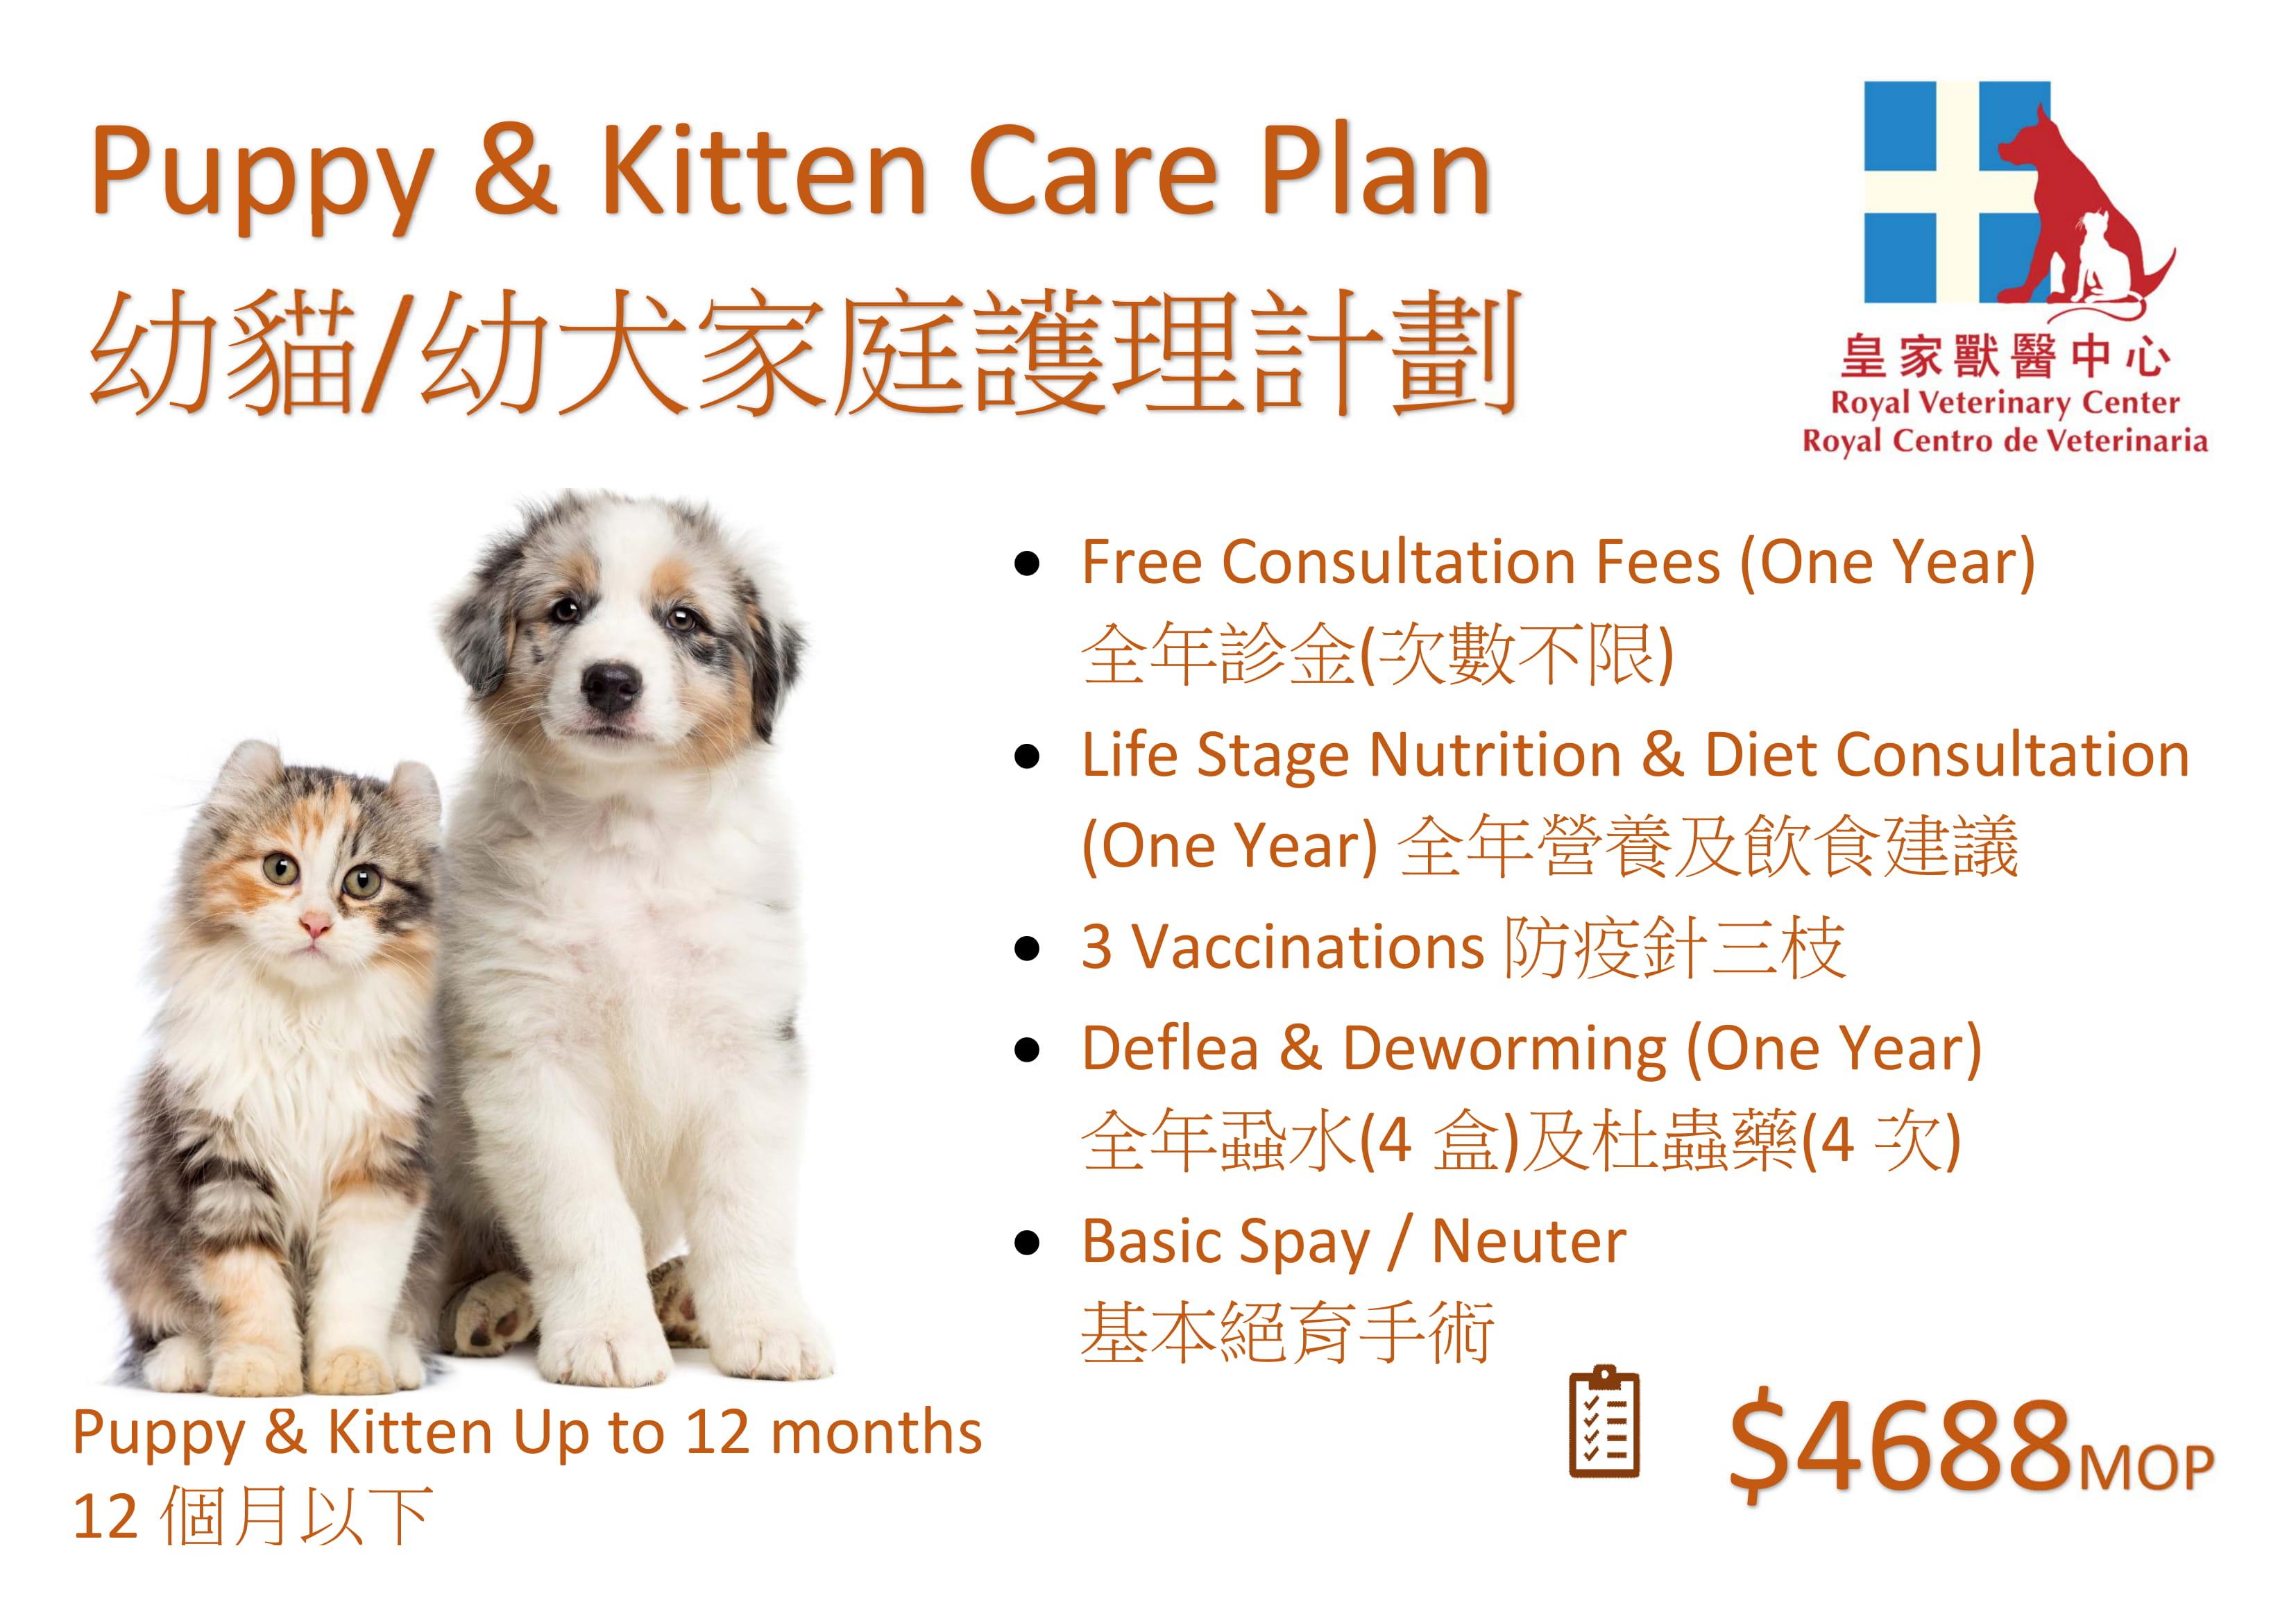 Puppy & Kitten Care Plan-1